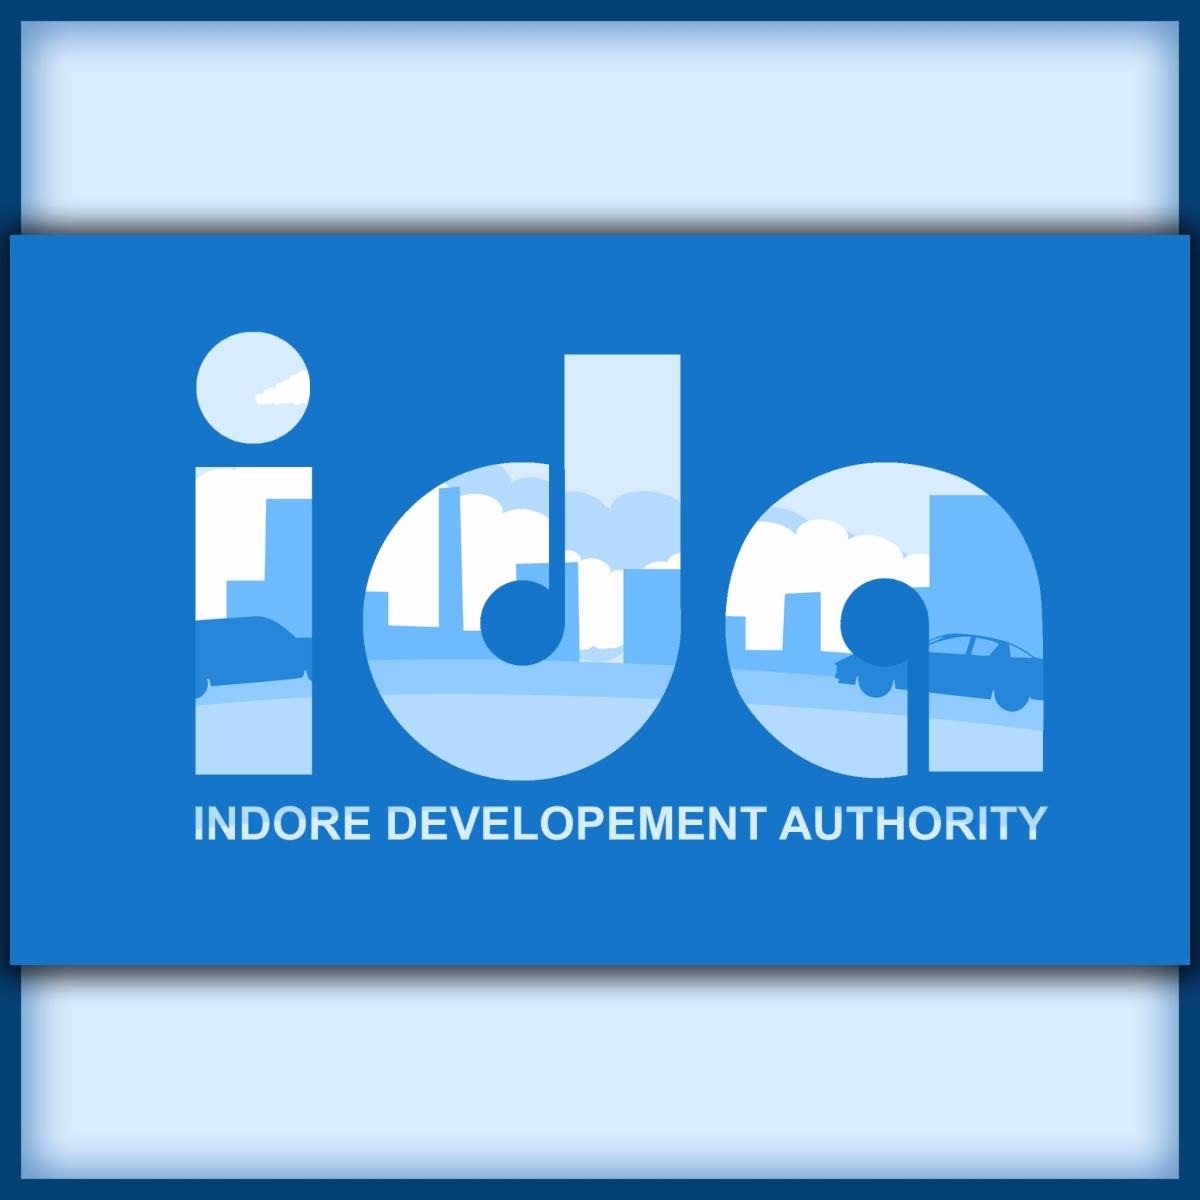 Indore: IDA board meeting today